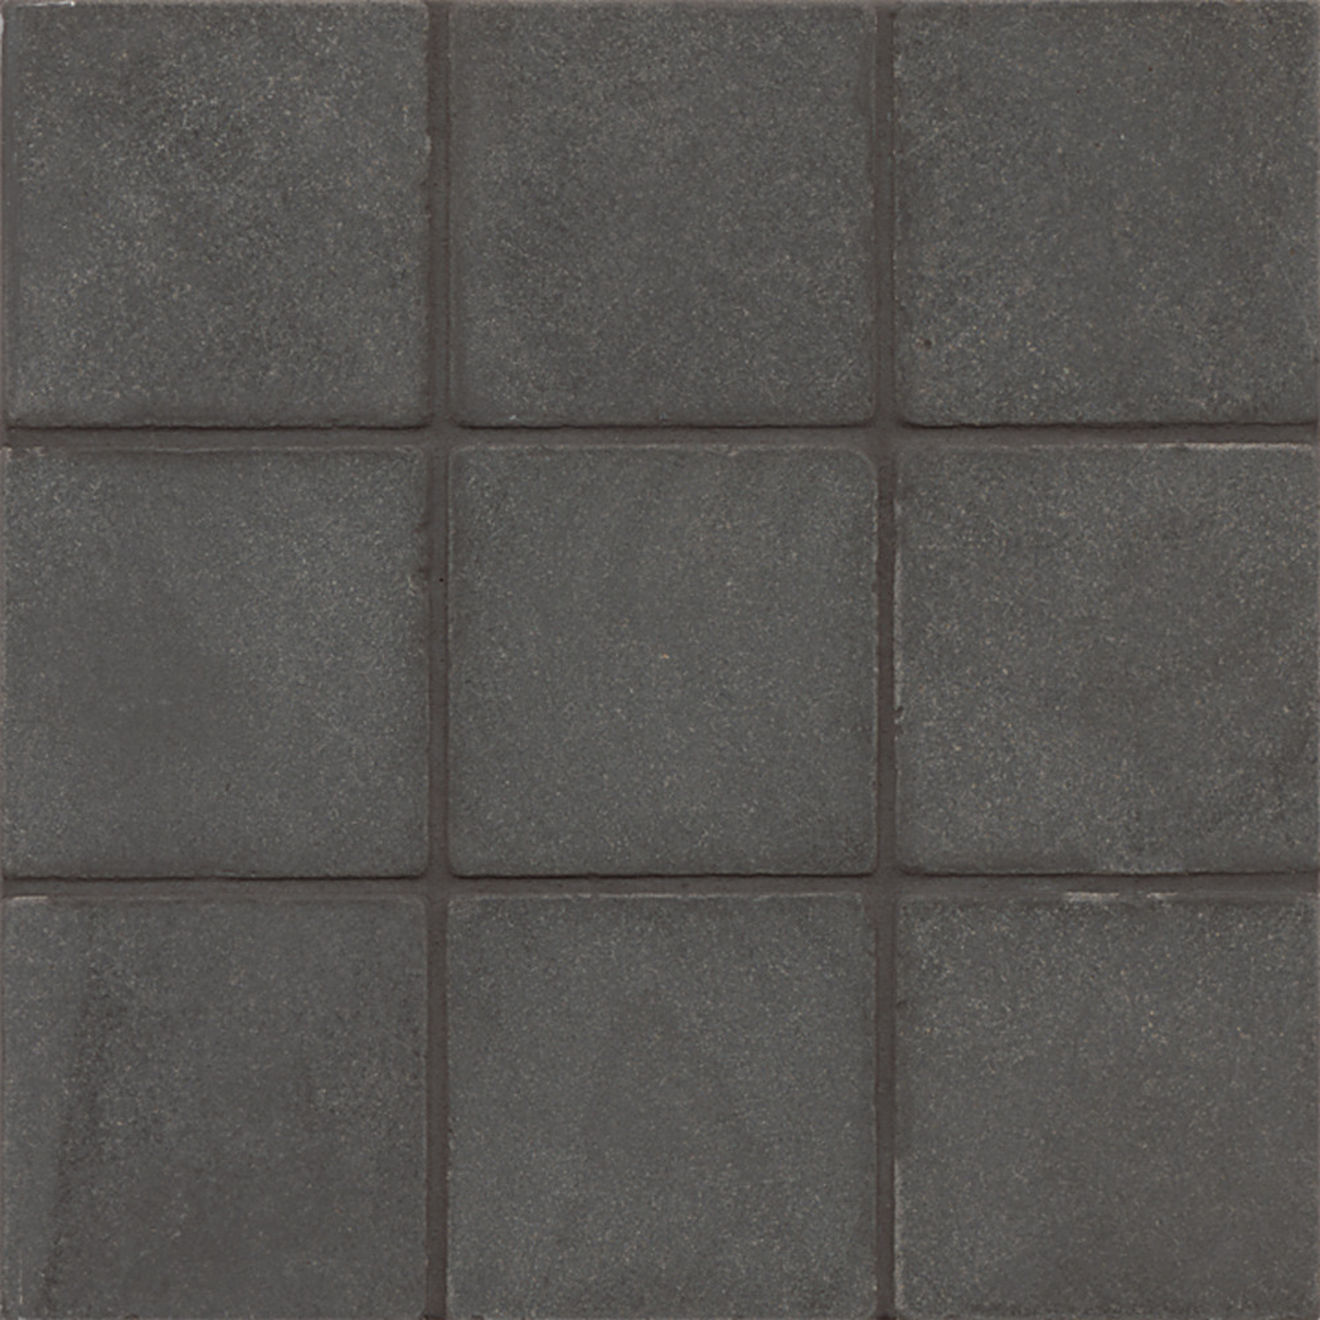 "Absolute Black 4"" x 4"" Floor & Wall Tile"